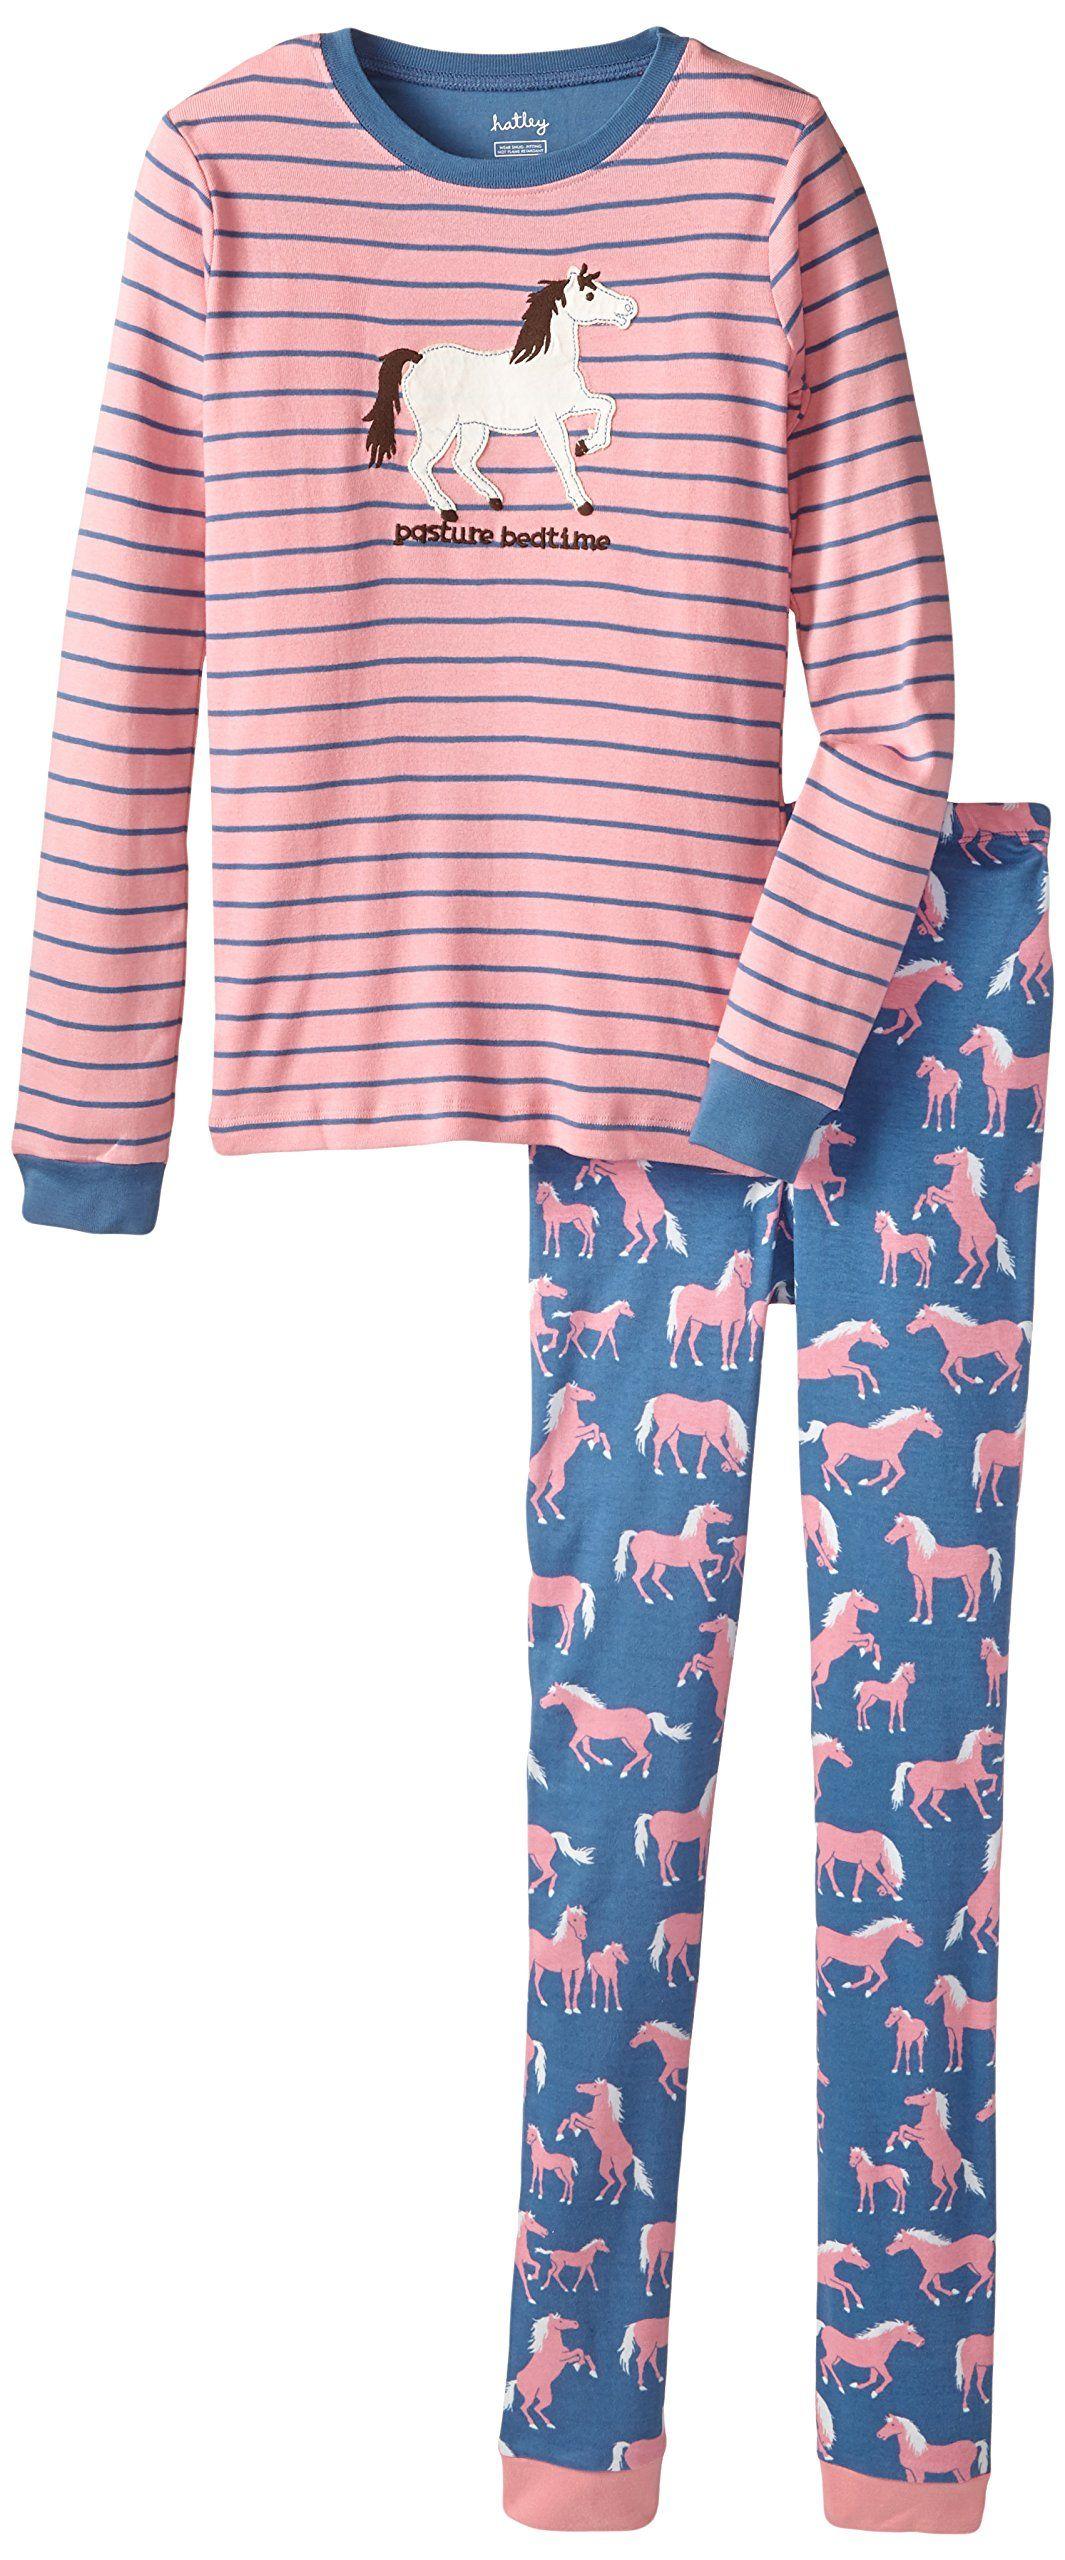 fbc7f78b8 Hatley Little Girls  Pajama Set - Show Horses Pasture Bedtime